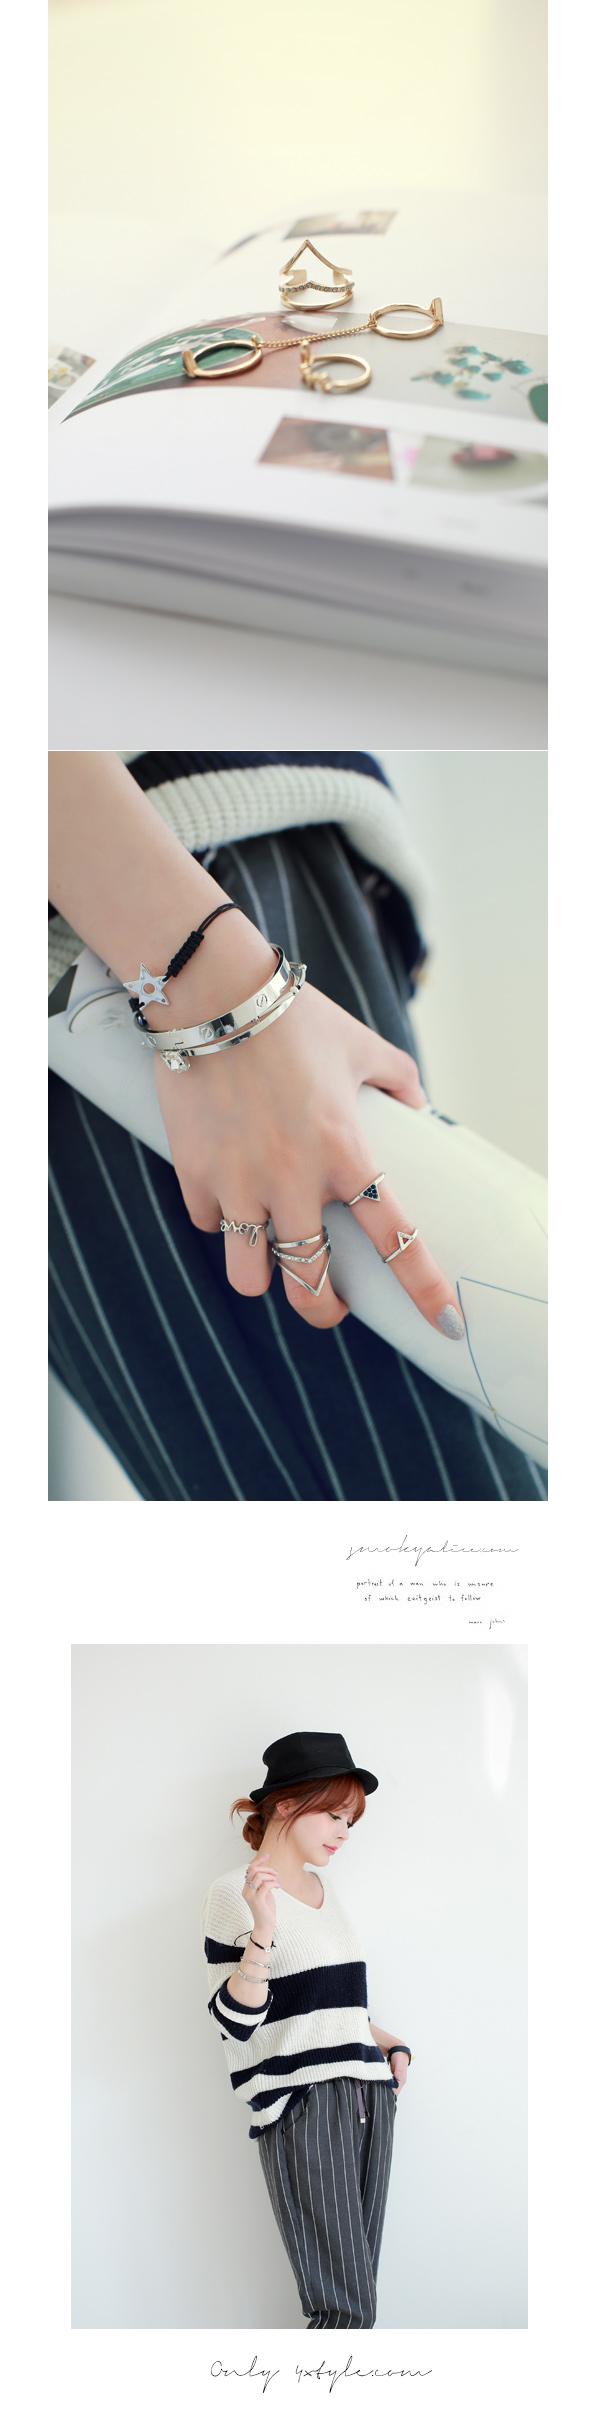 [ 4xtyle ] Women Joffrey Ring, 2 Colors